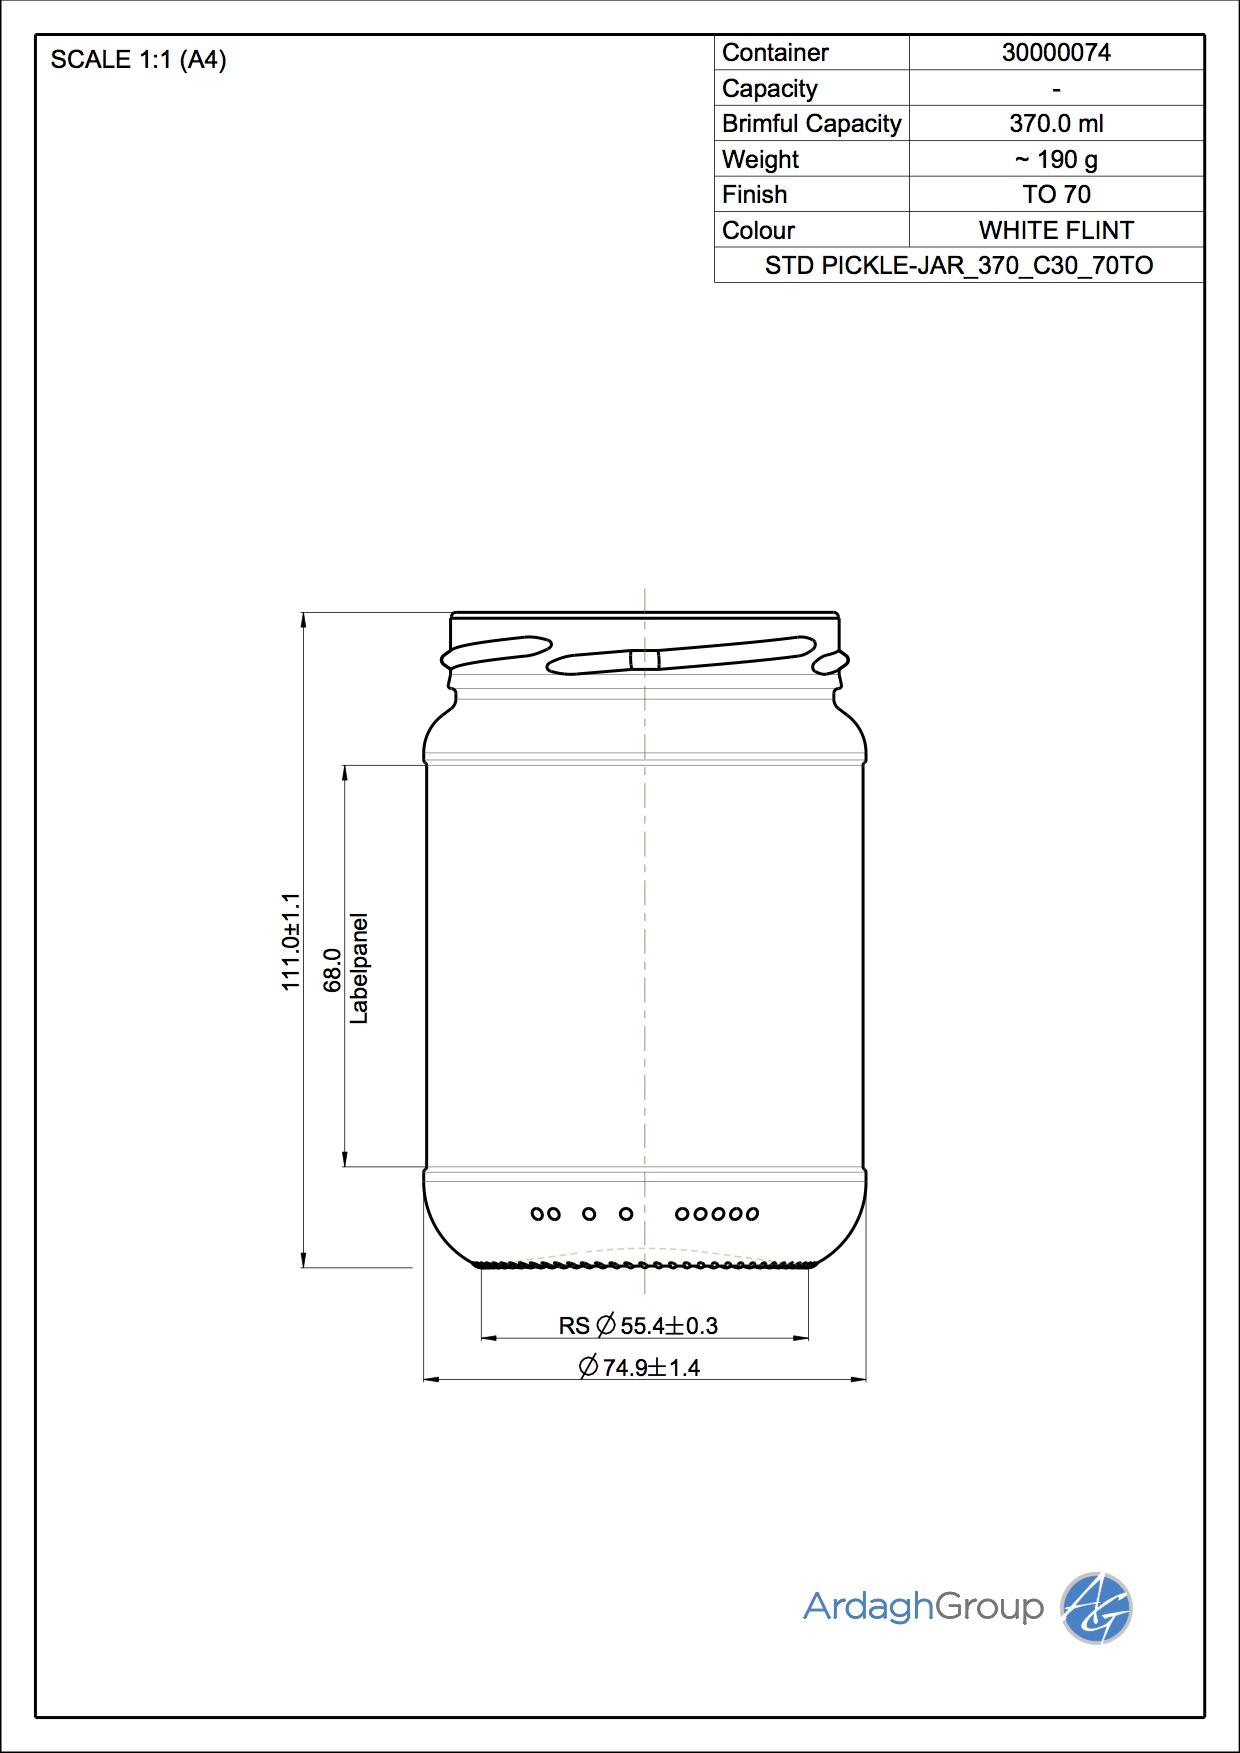 STD PICKLE-JAR_370_C30_70TO